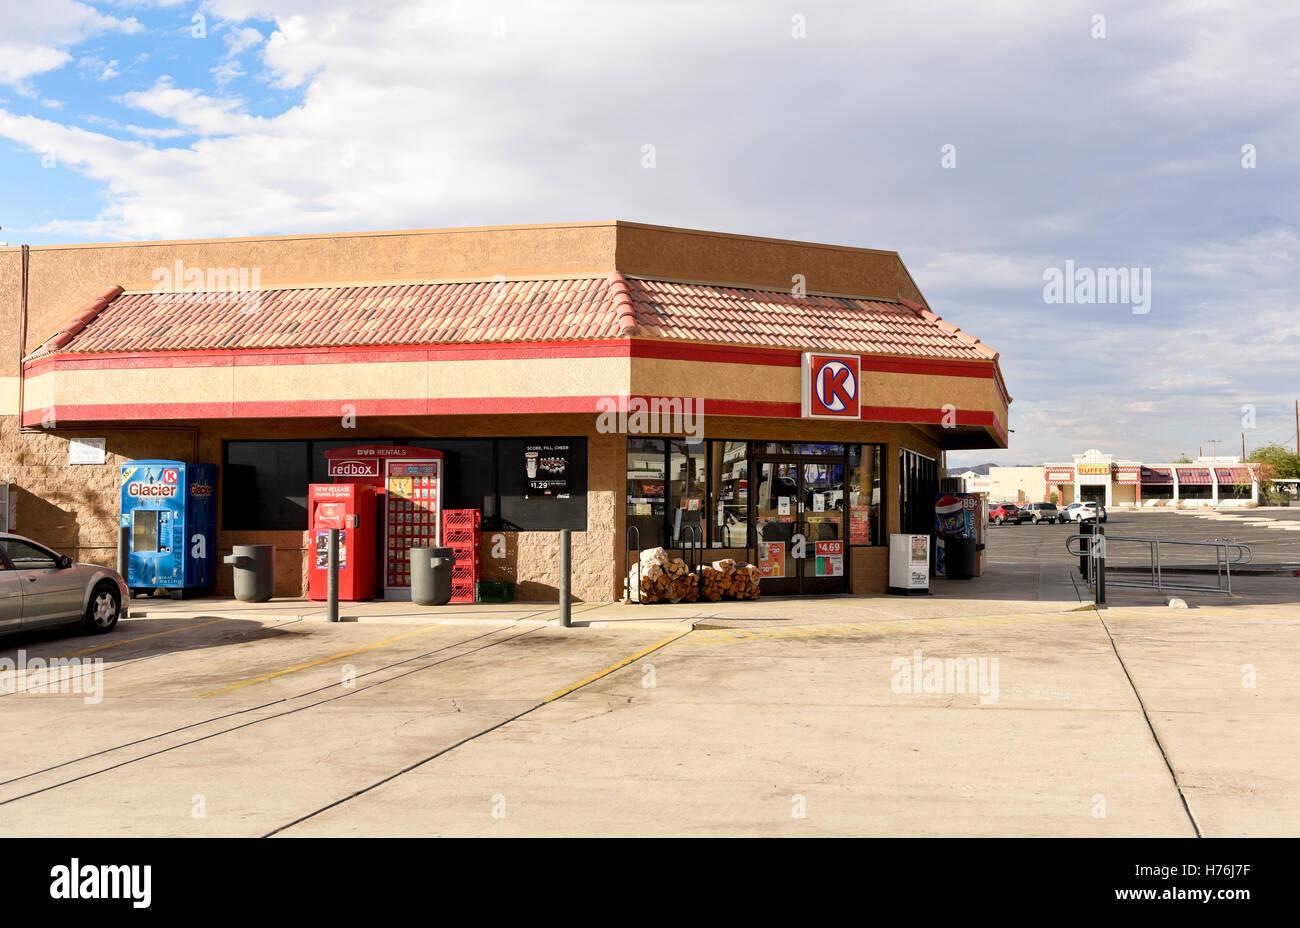 Convenience Store Exterior Usa Stock Photos & Convenience Store